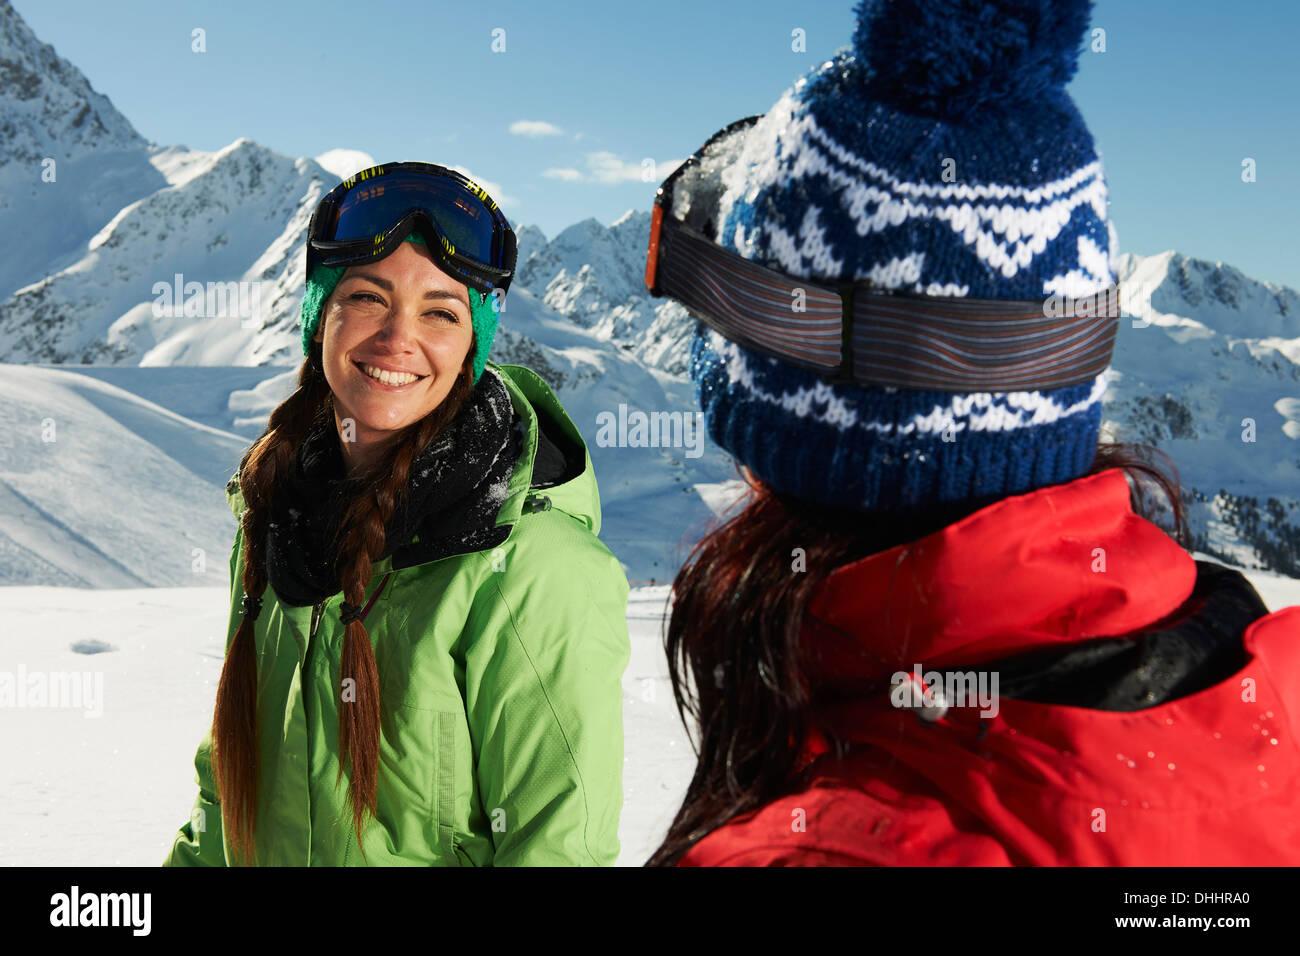 Two women wearing knit hats in snow, Kuhtai, Austria - Stock Image